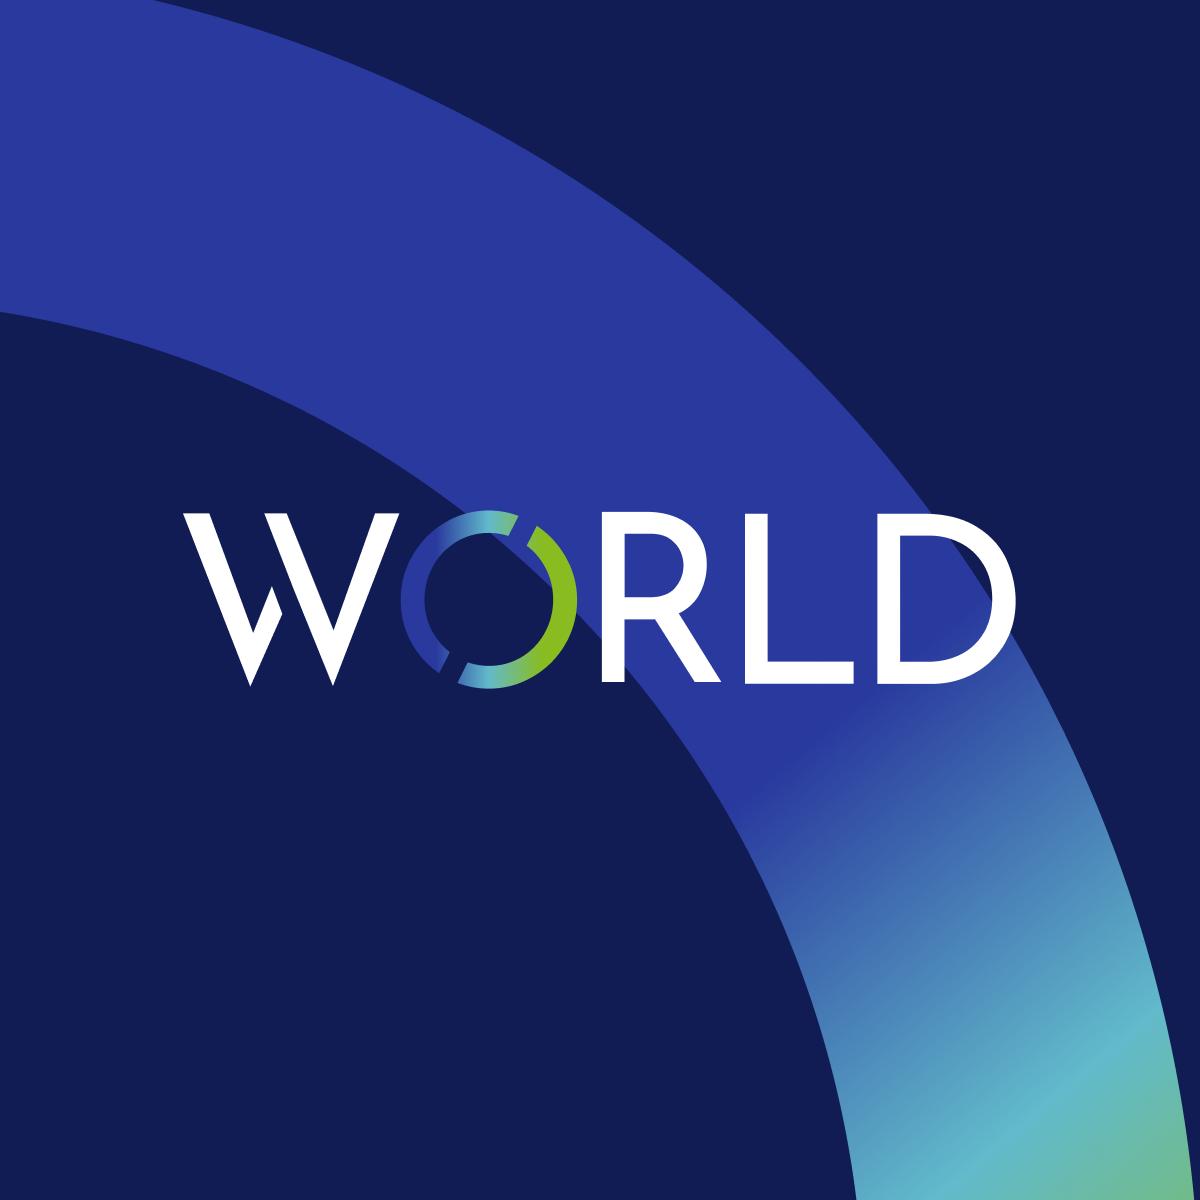 World Insurance Associates LLC - We Bring the World to You